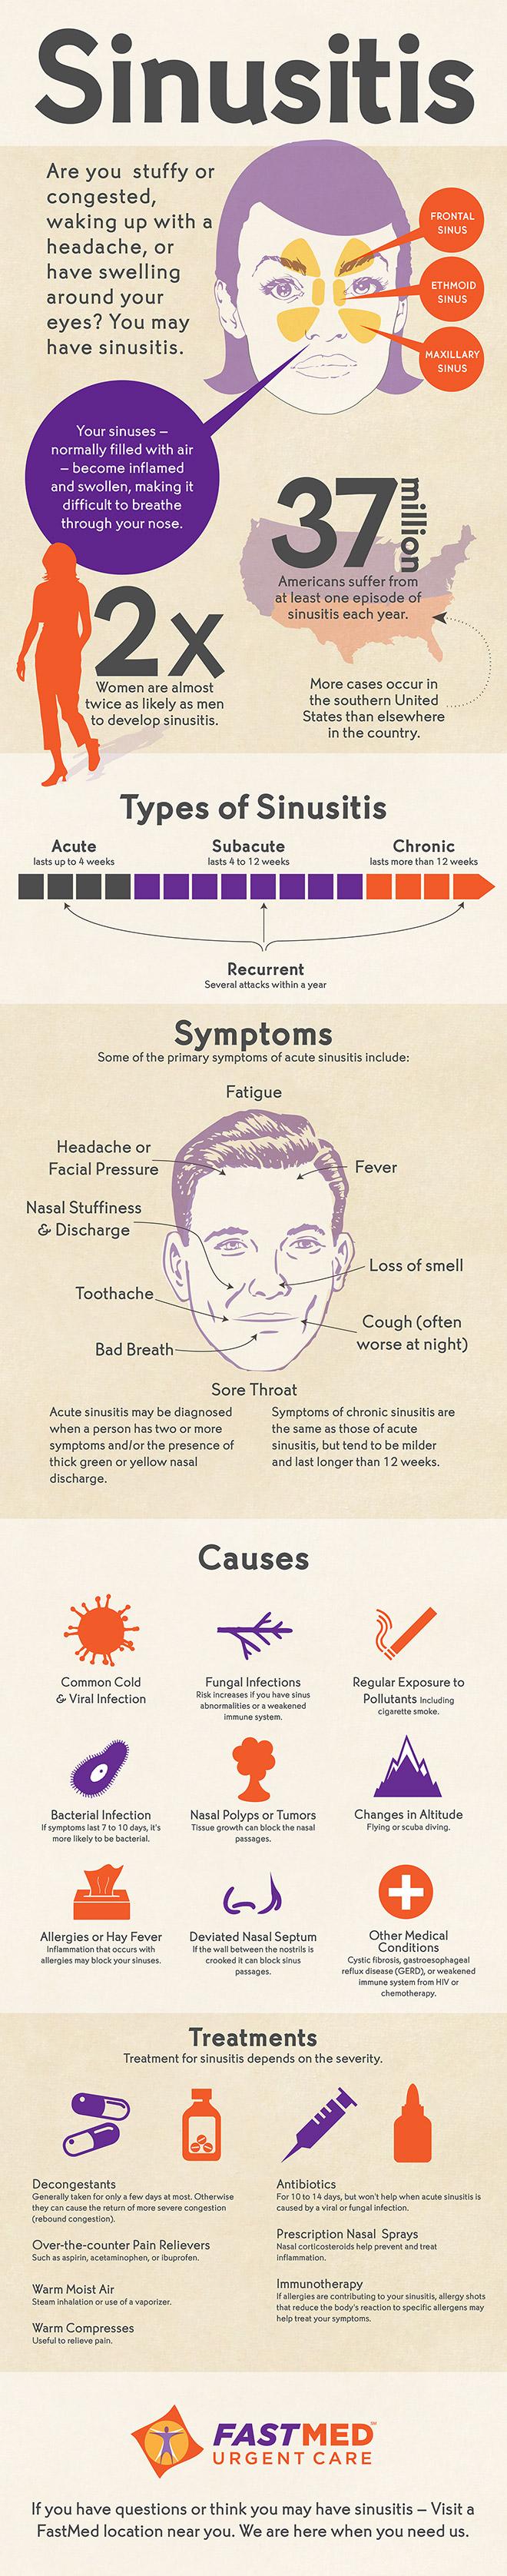 Sinusitis Infographic